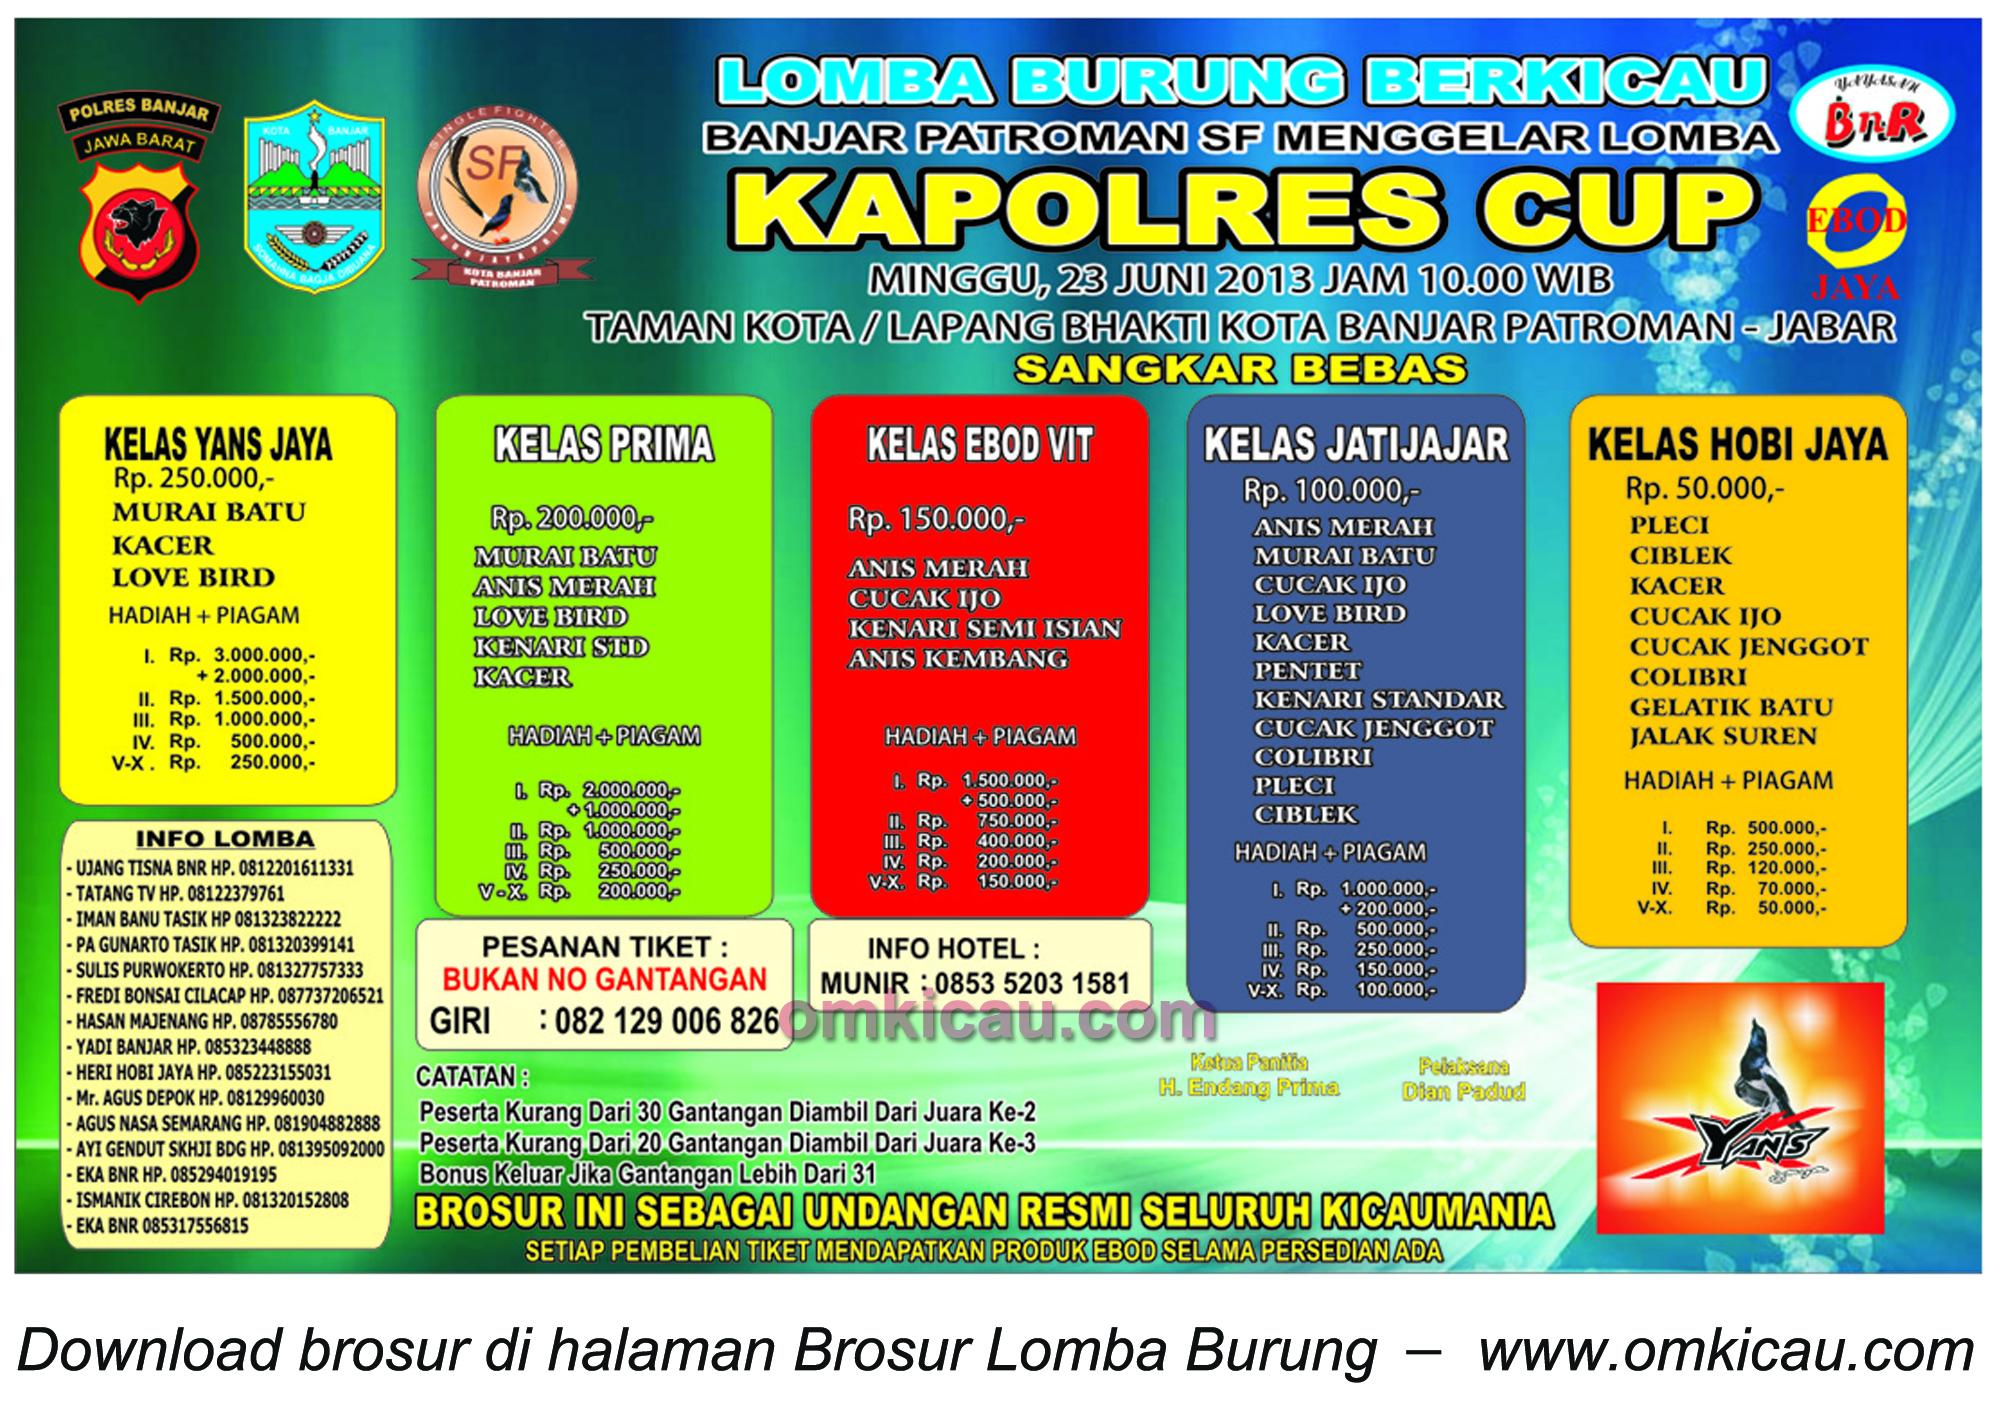 Brosur Lomba Burung Kapolres Cup Banjar Patroman 30 Juni 2013